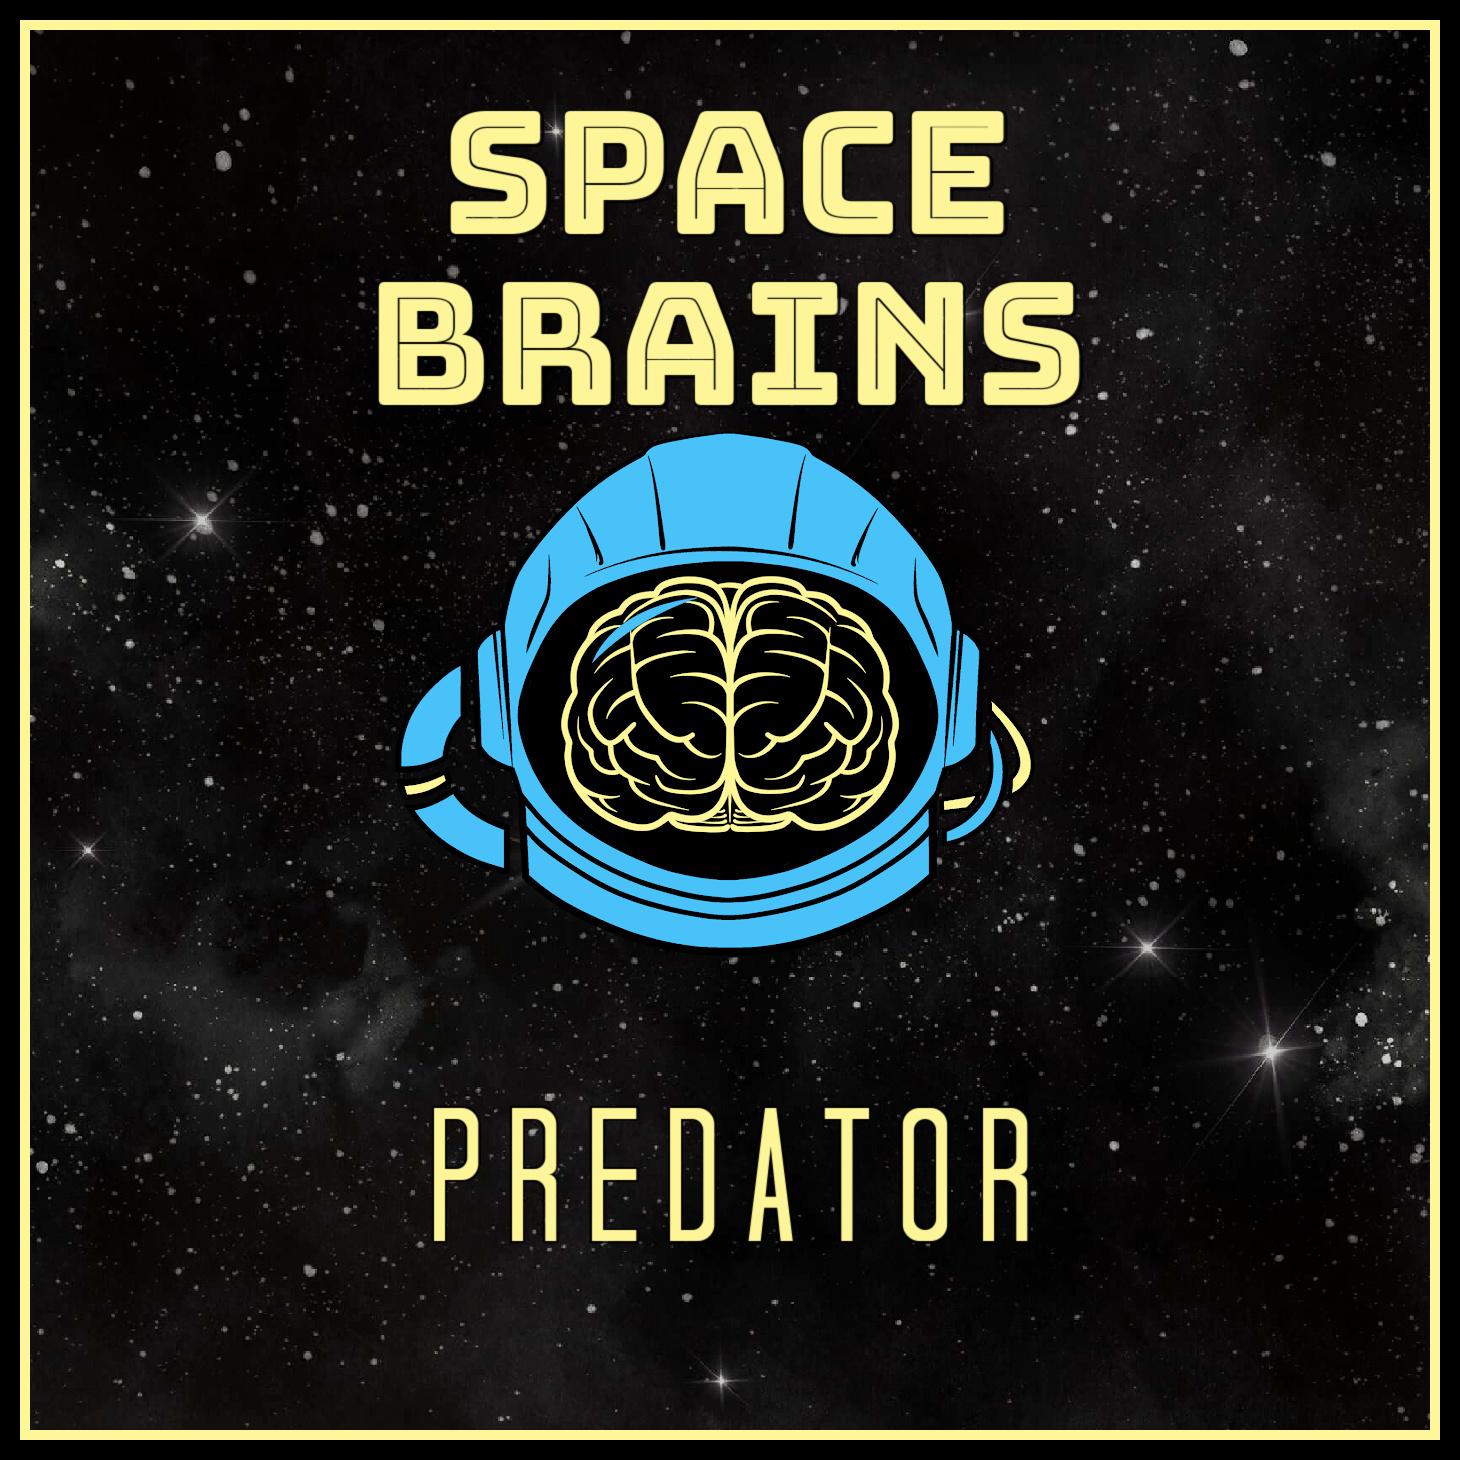 Space Brains - 15 - Predator